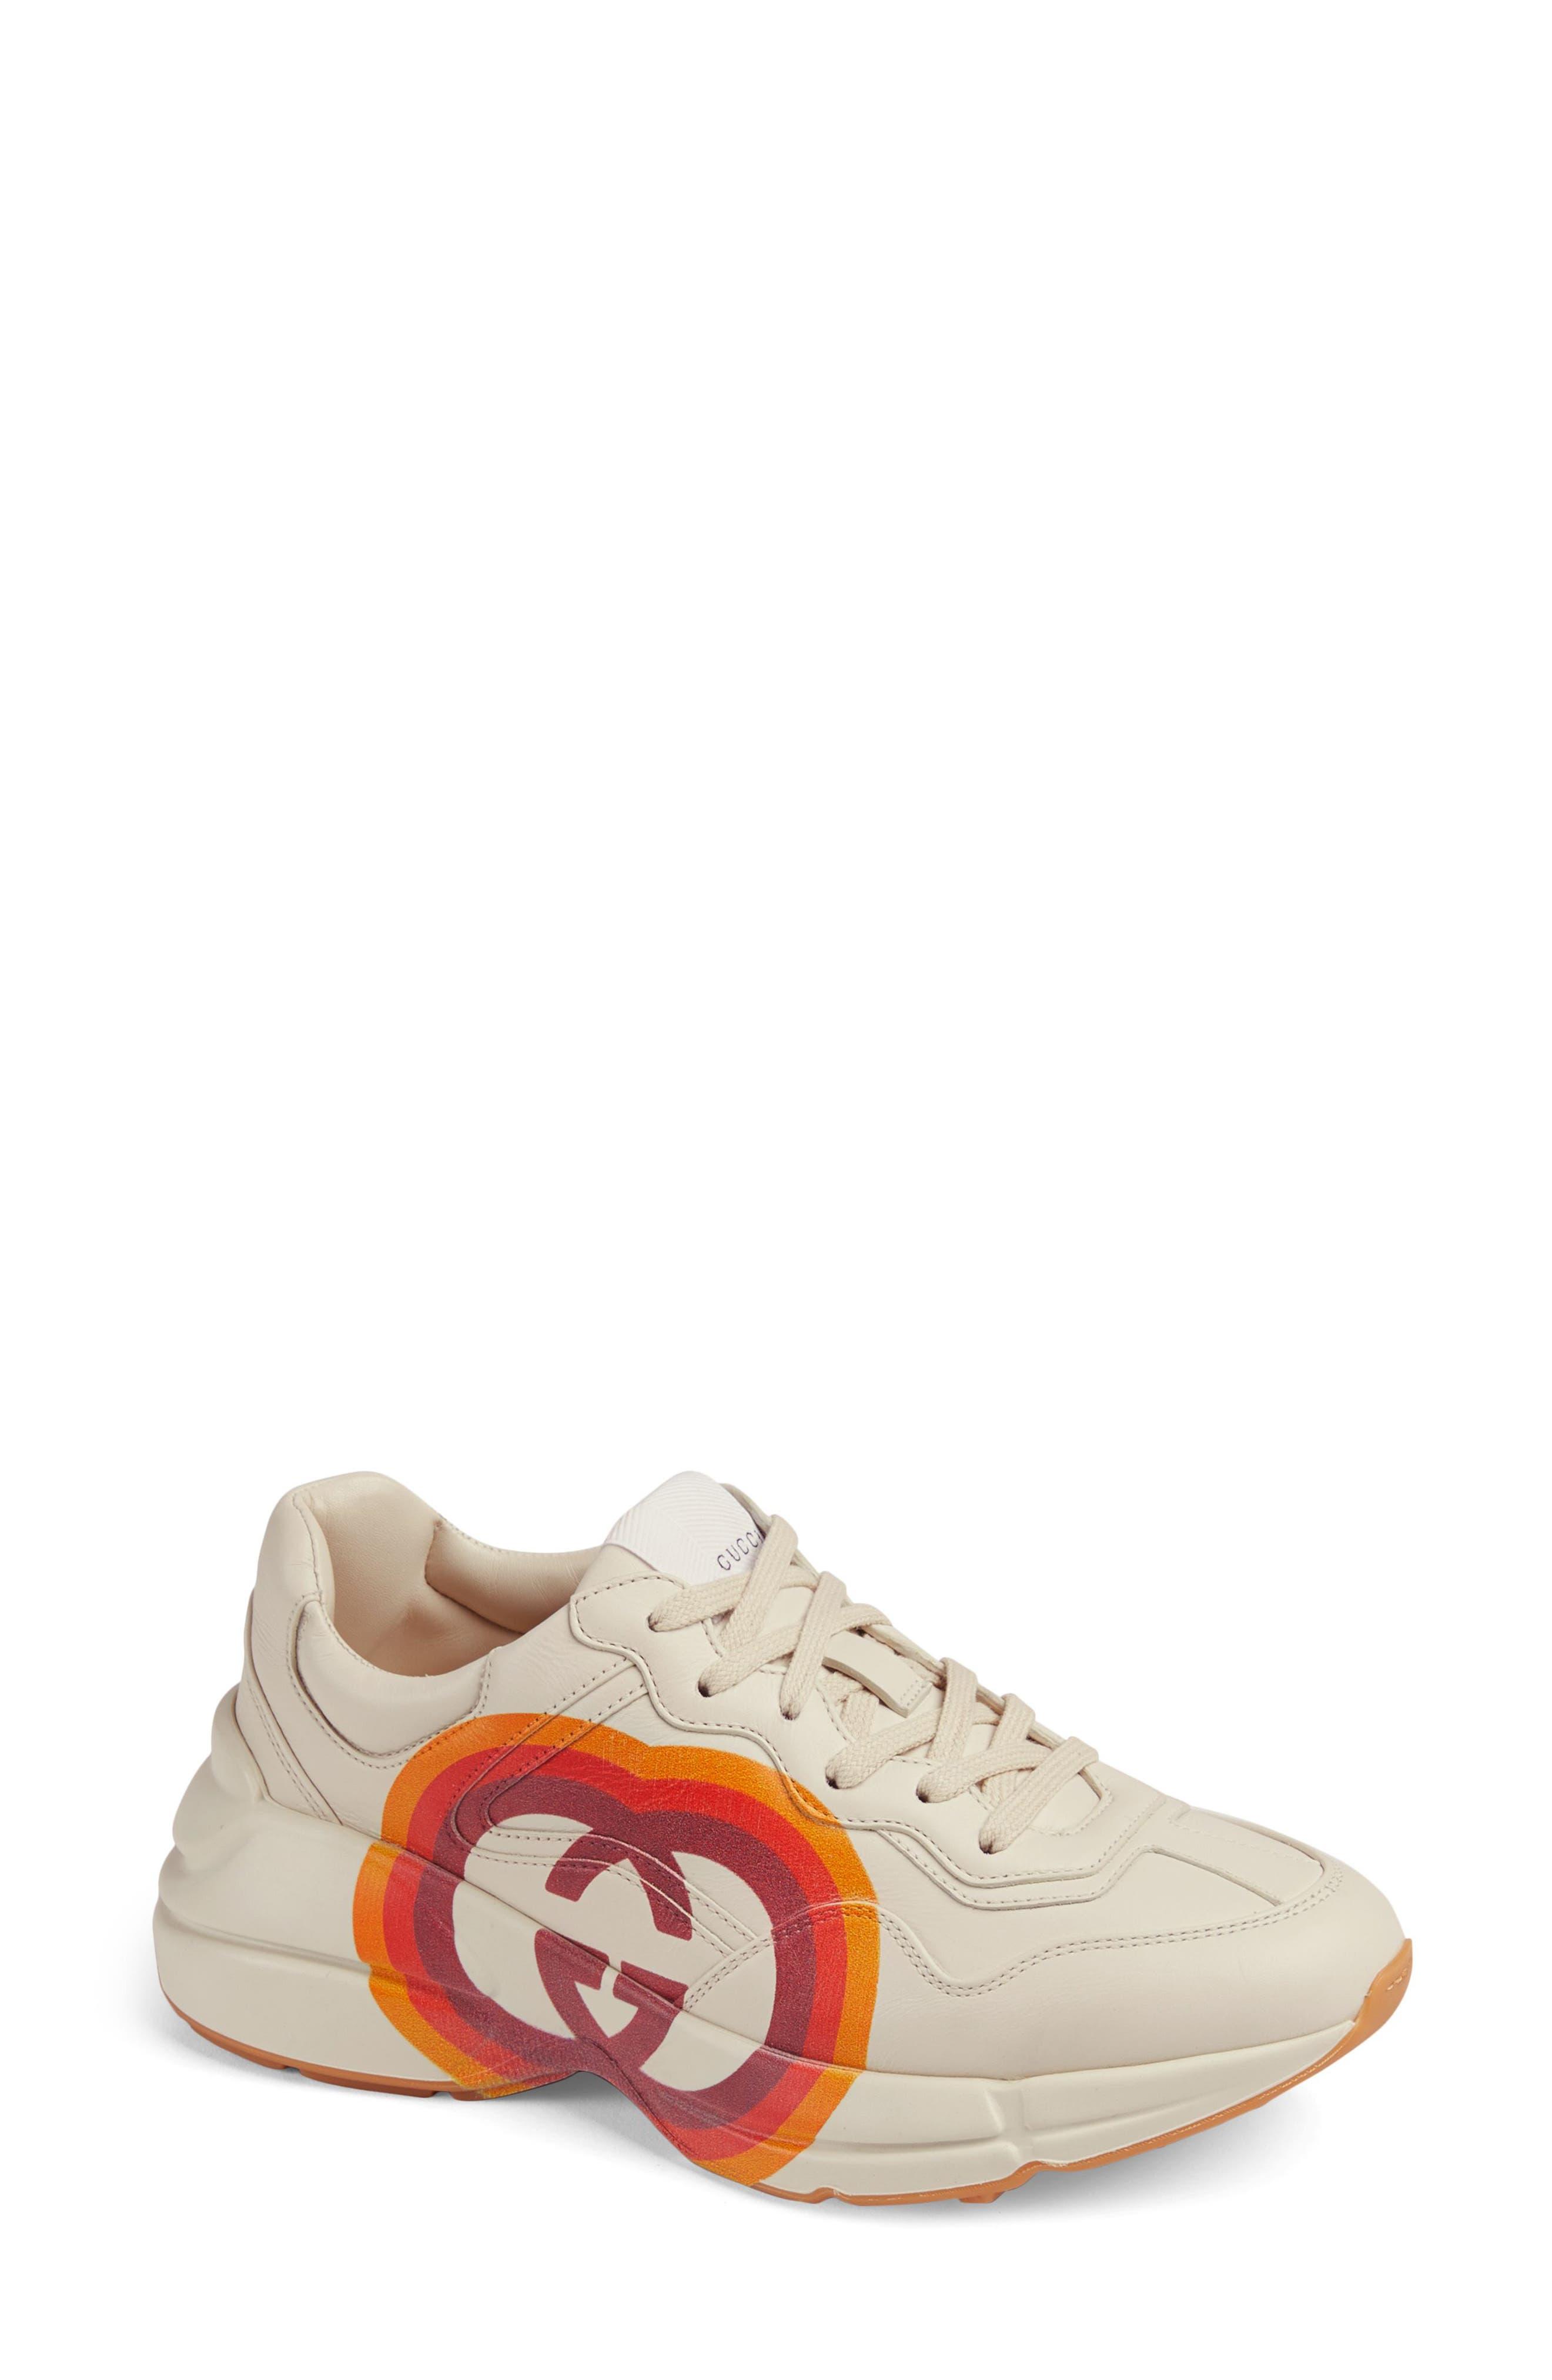 Rhyton Double G Sneaker,                         Main,                         color, MYSTIC WHITE